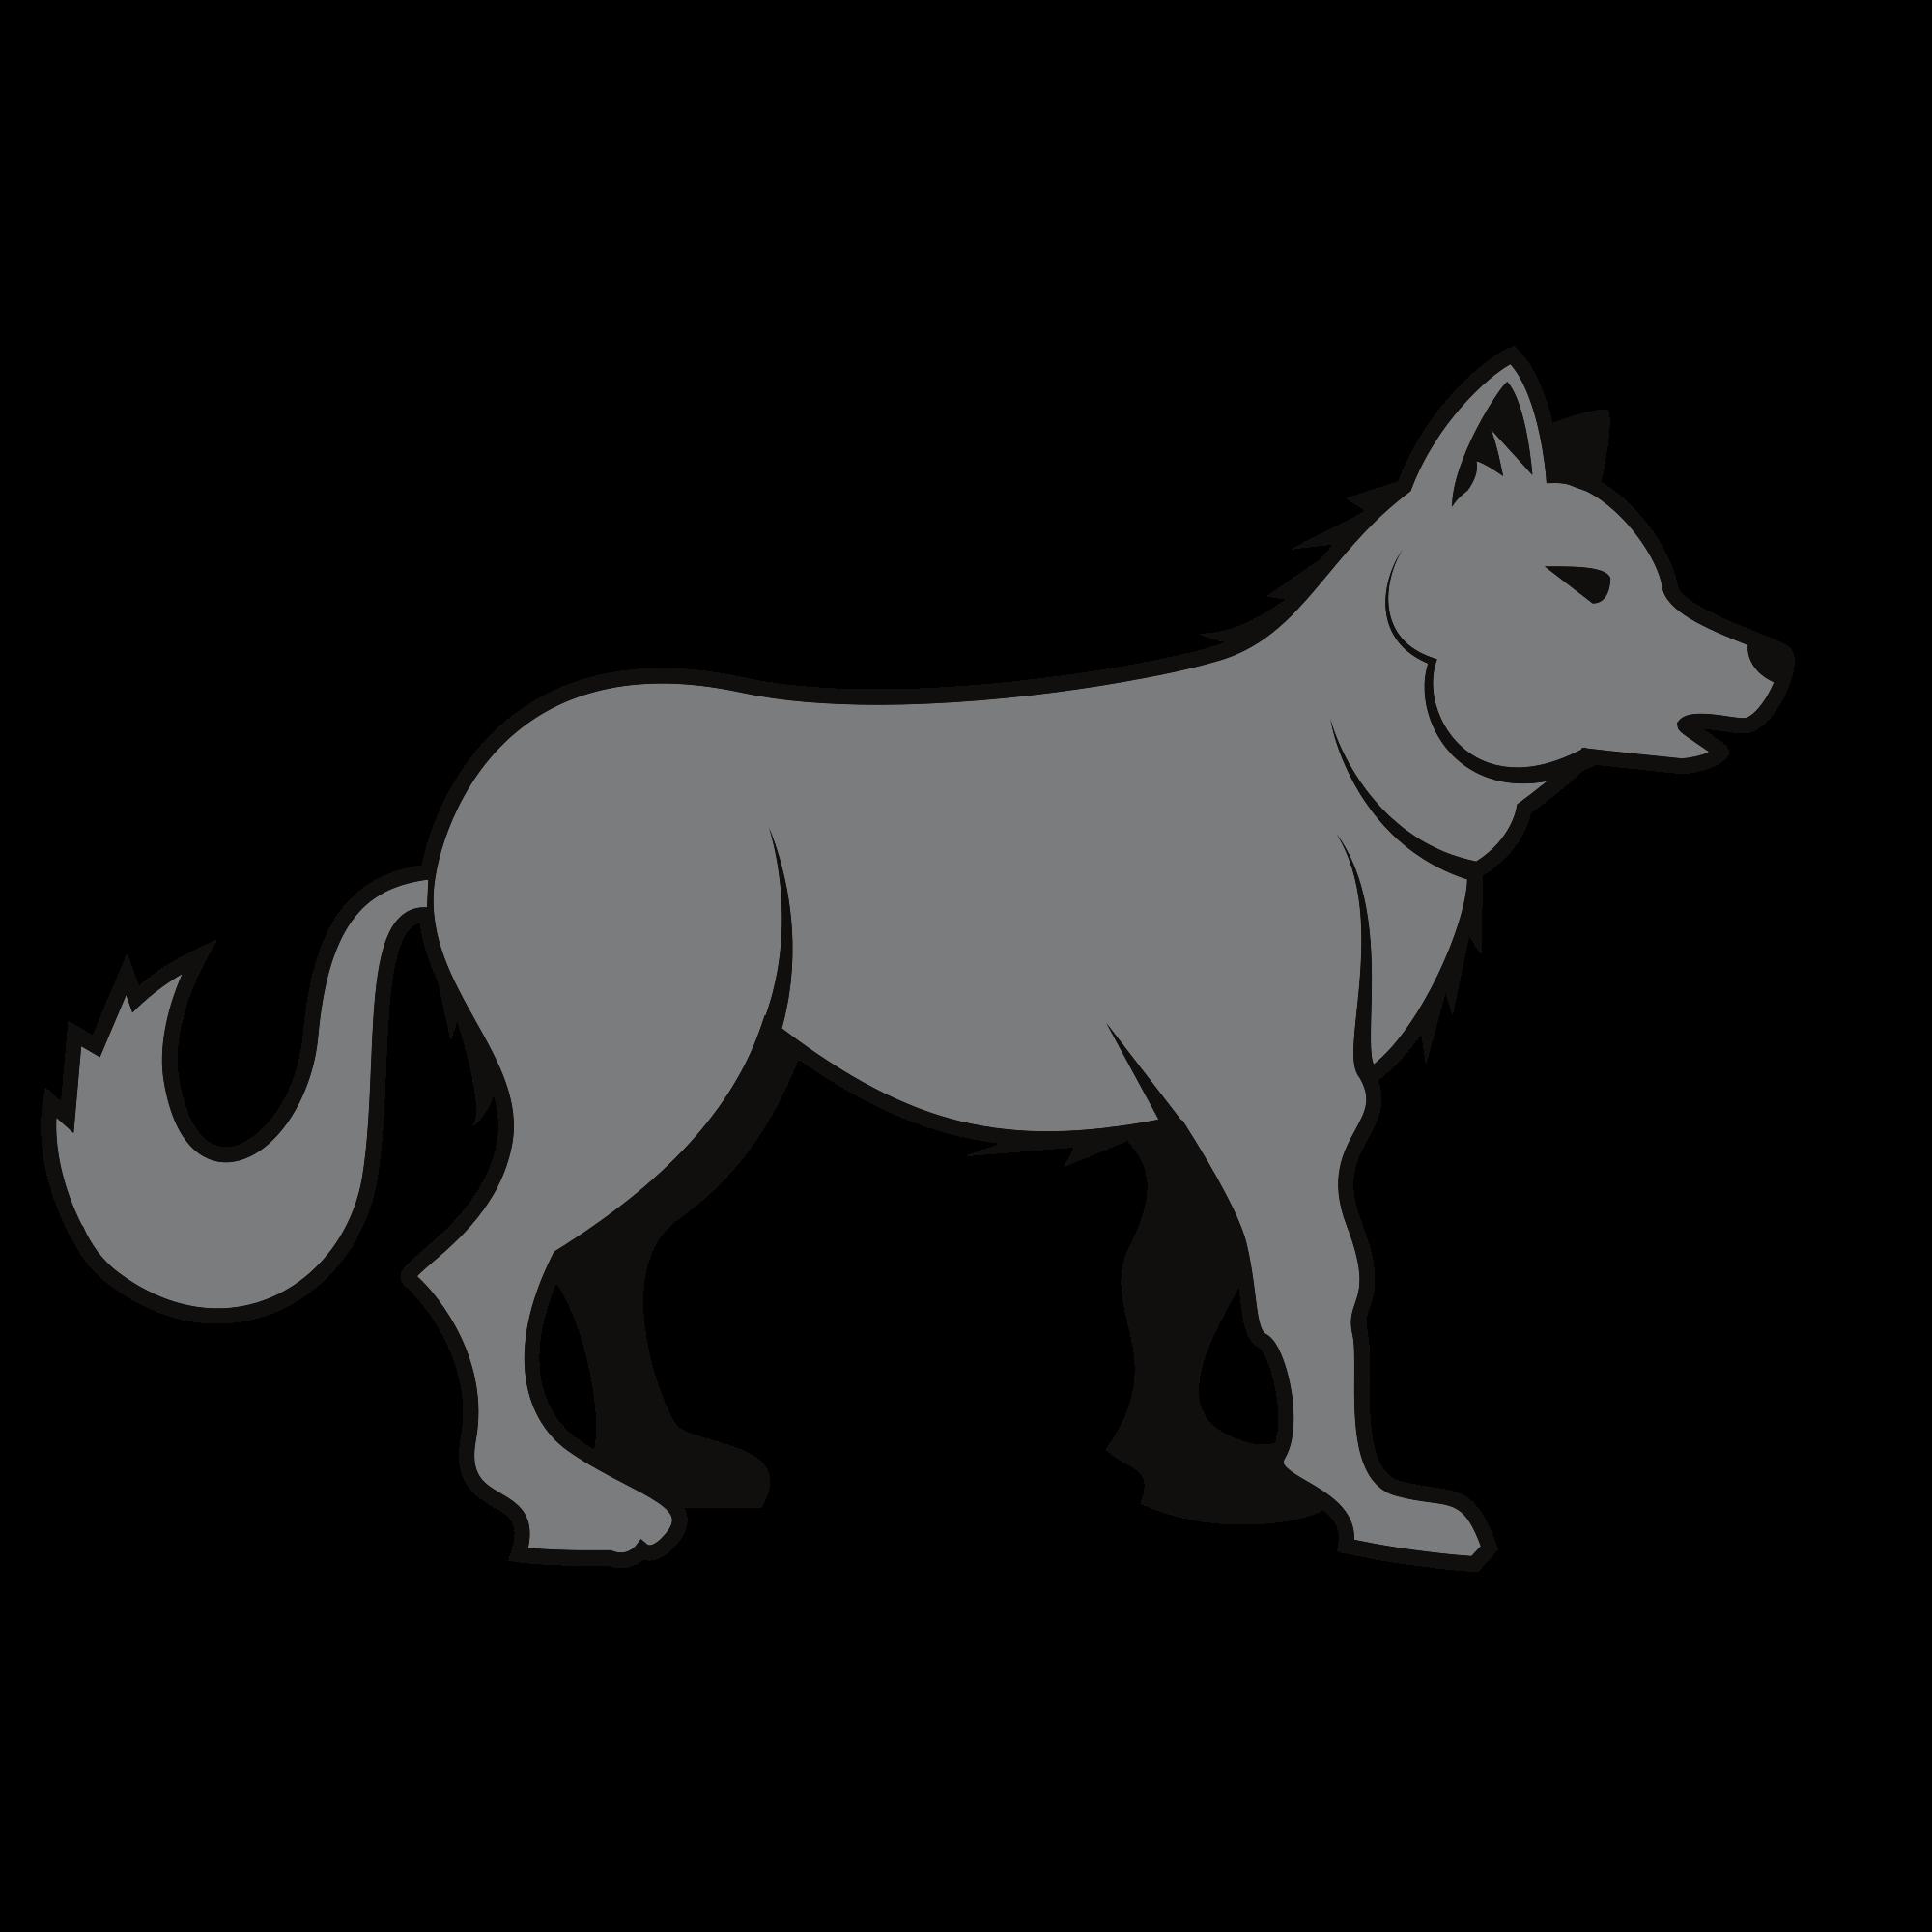 2000x2000 Filewolf Vector Image.svg